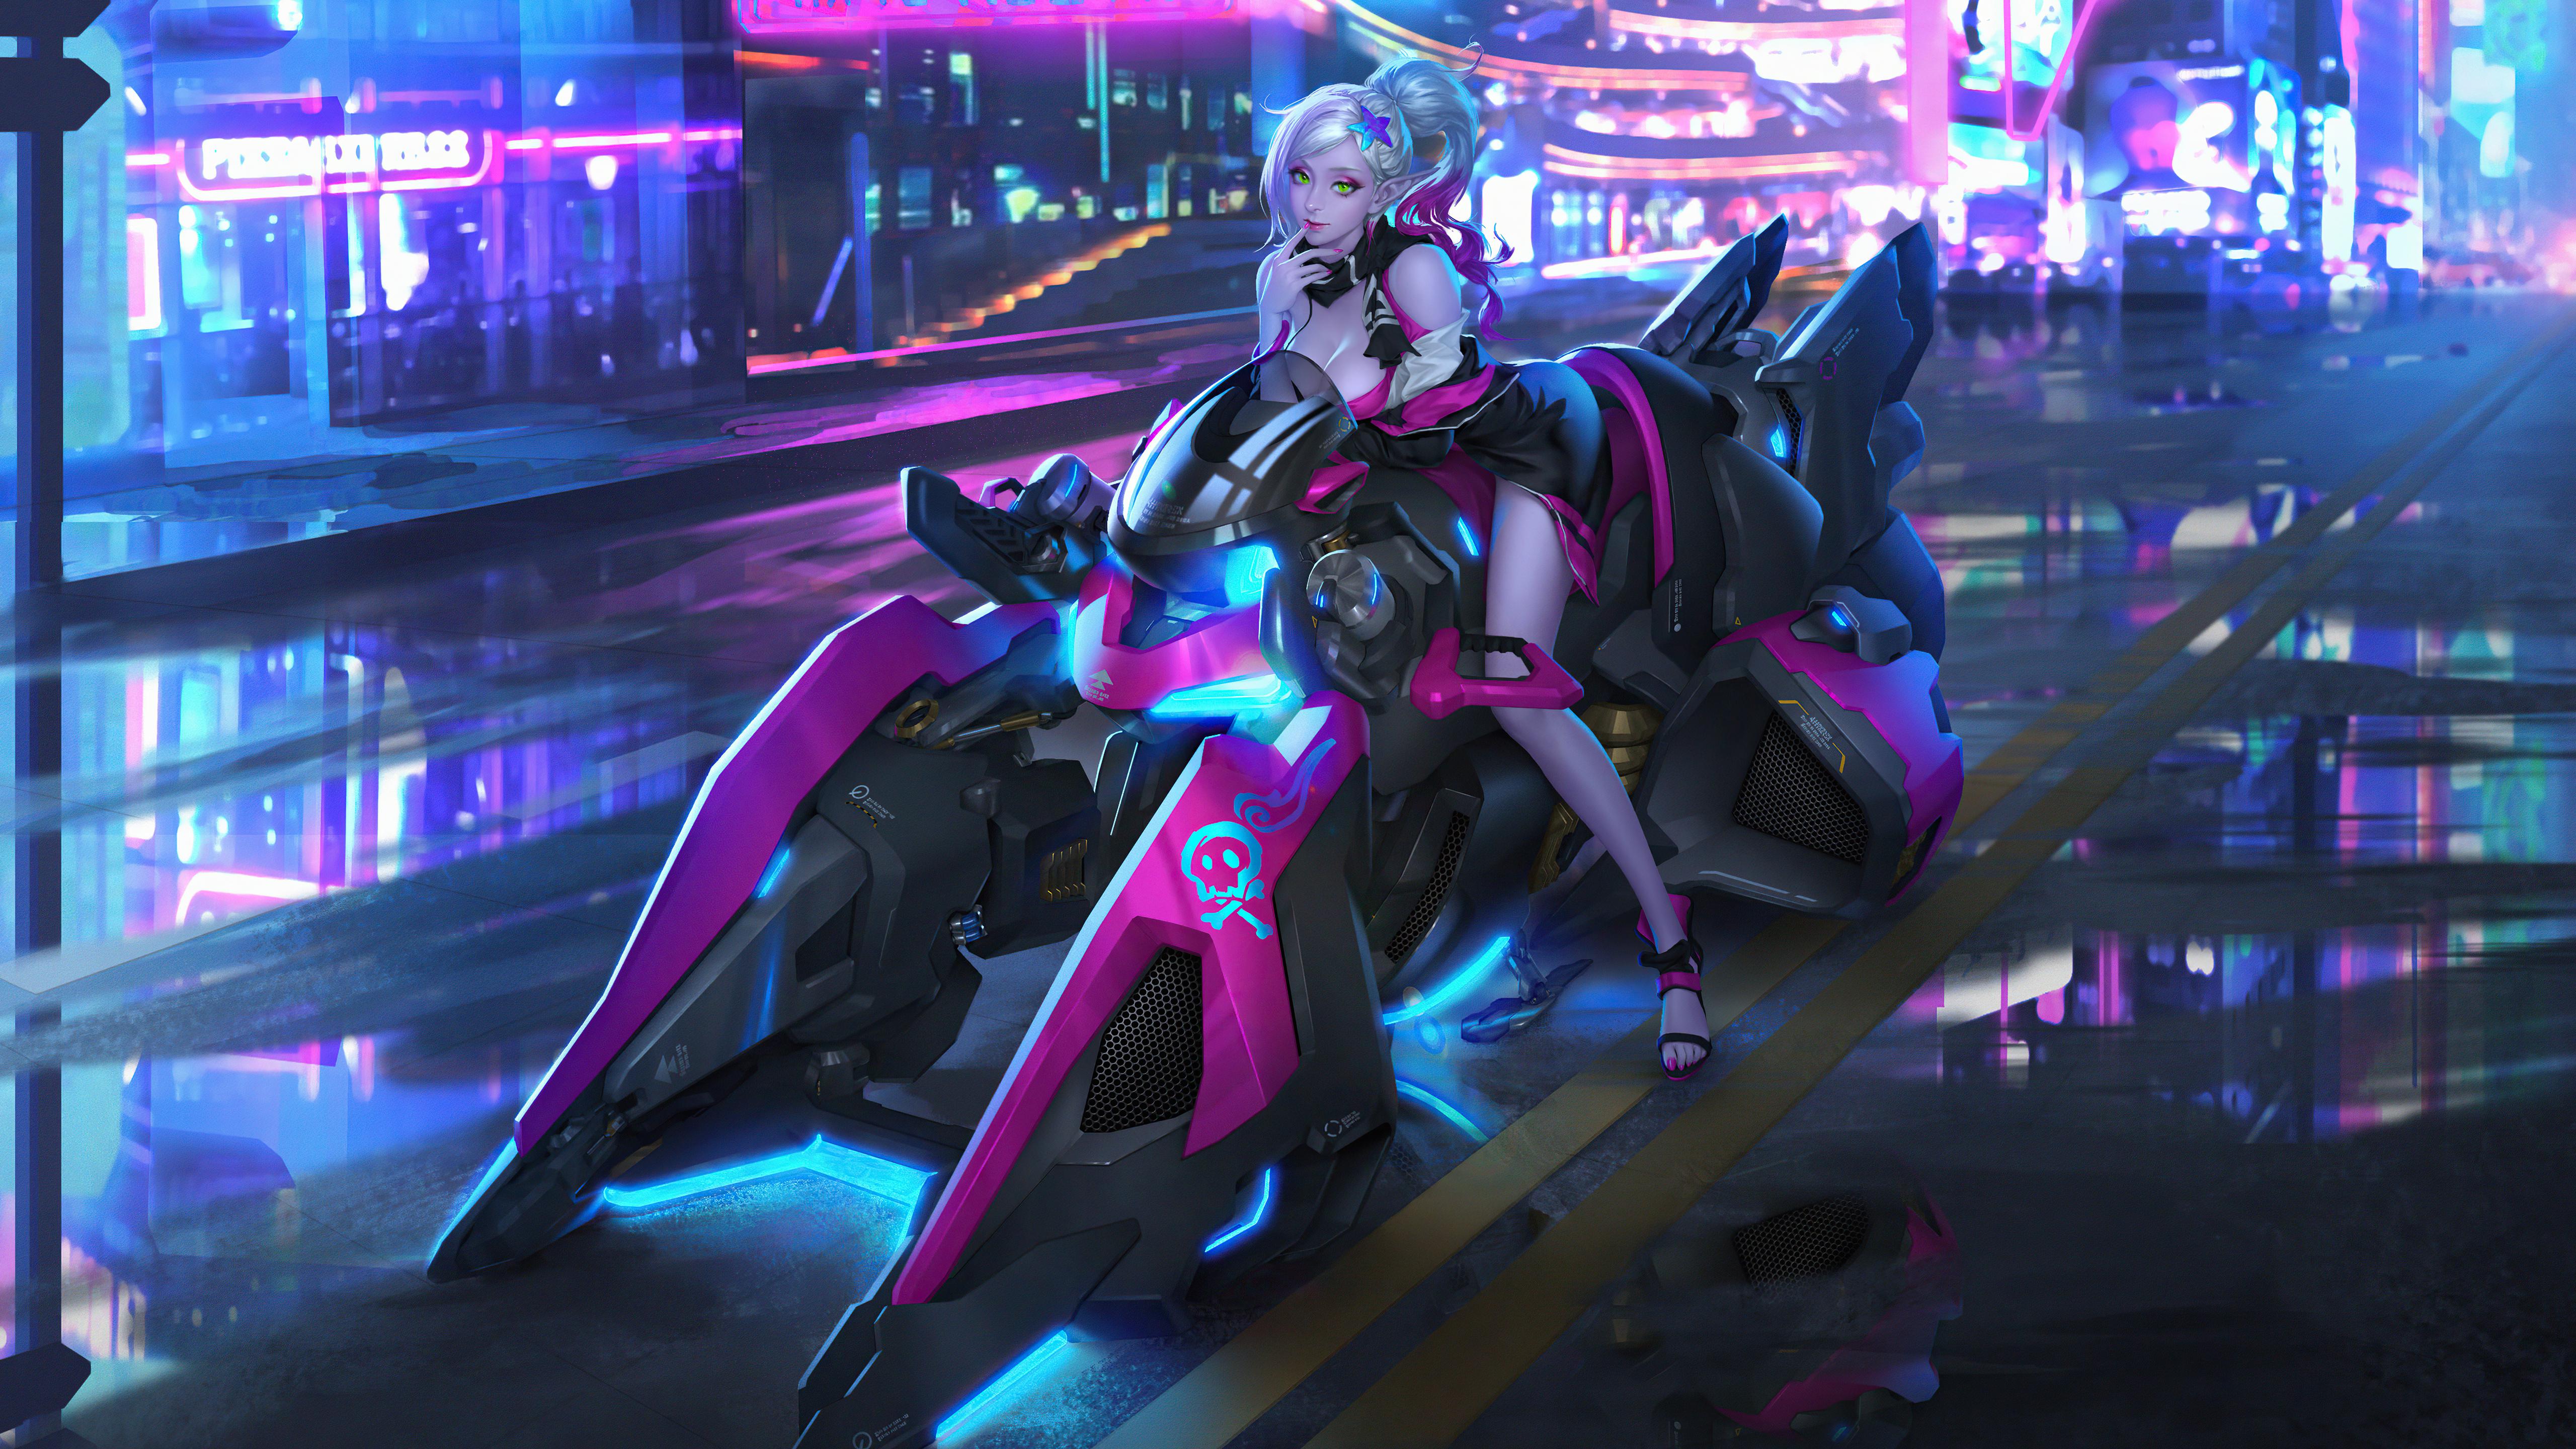 bich scifi ride 1630606984 - Bich Scifi Ride -